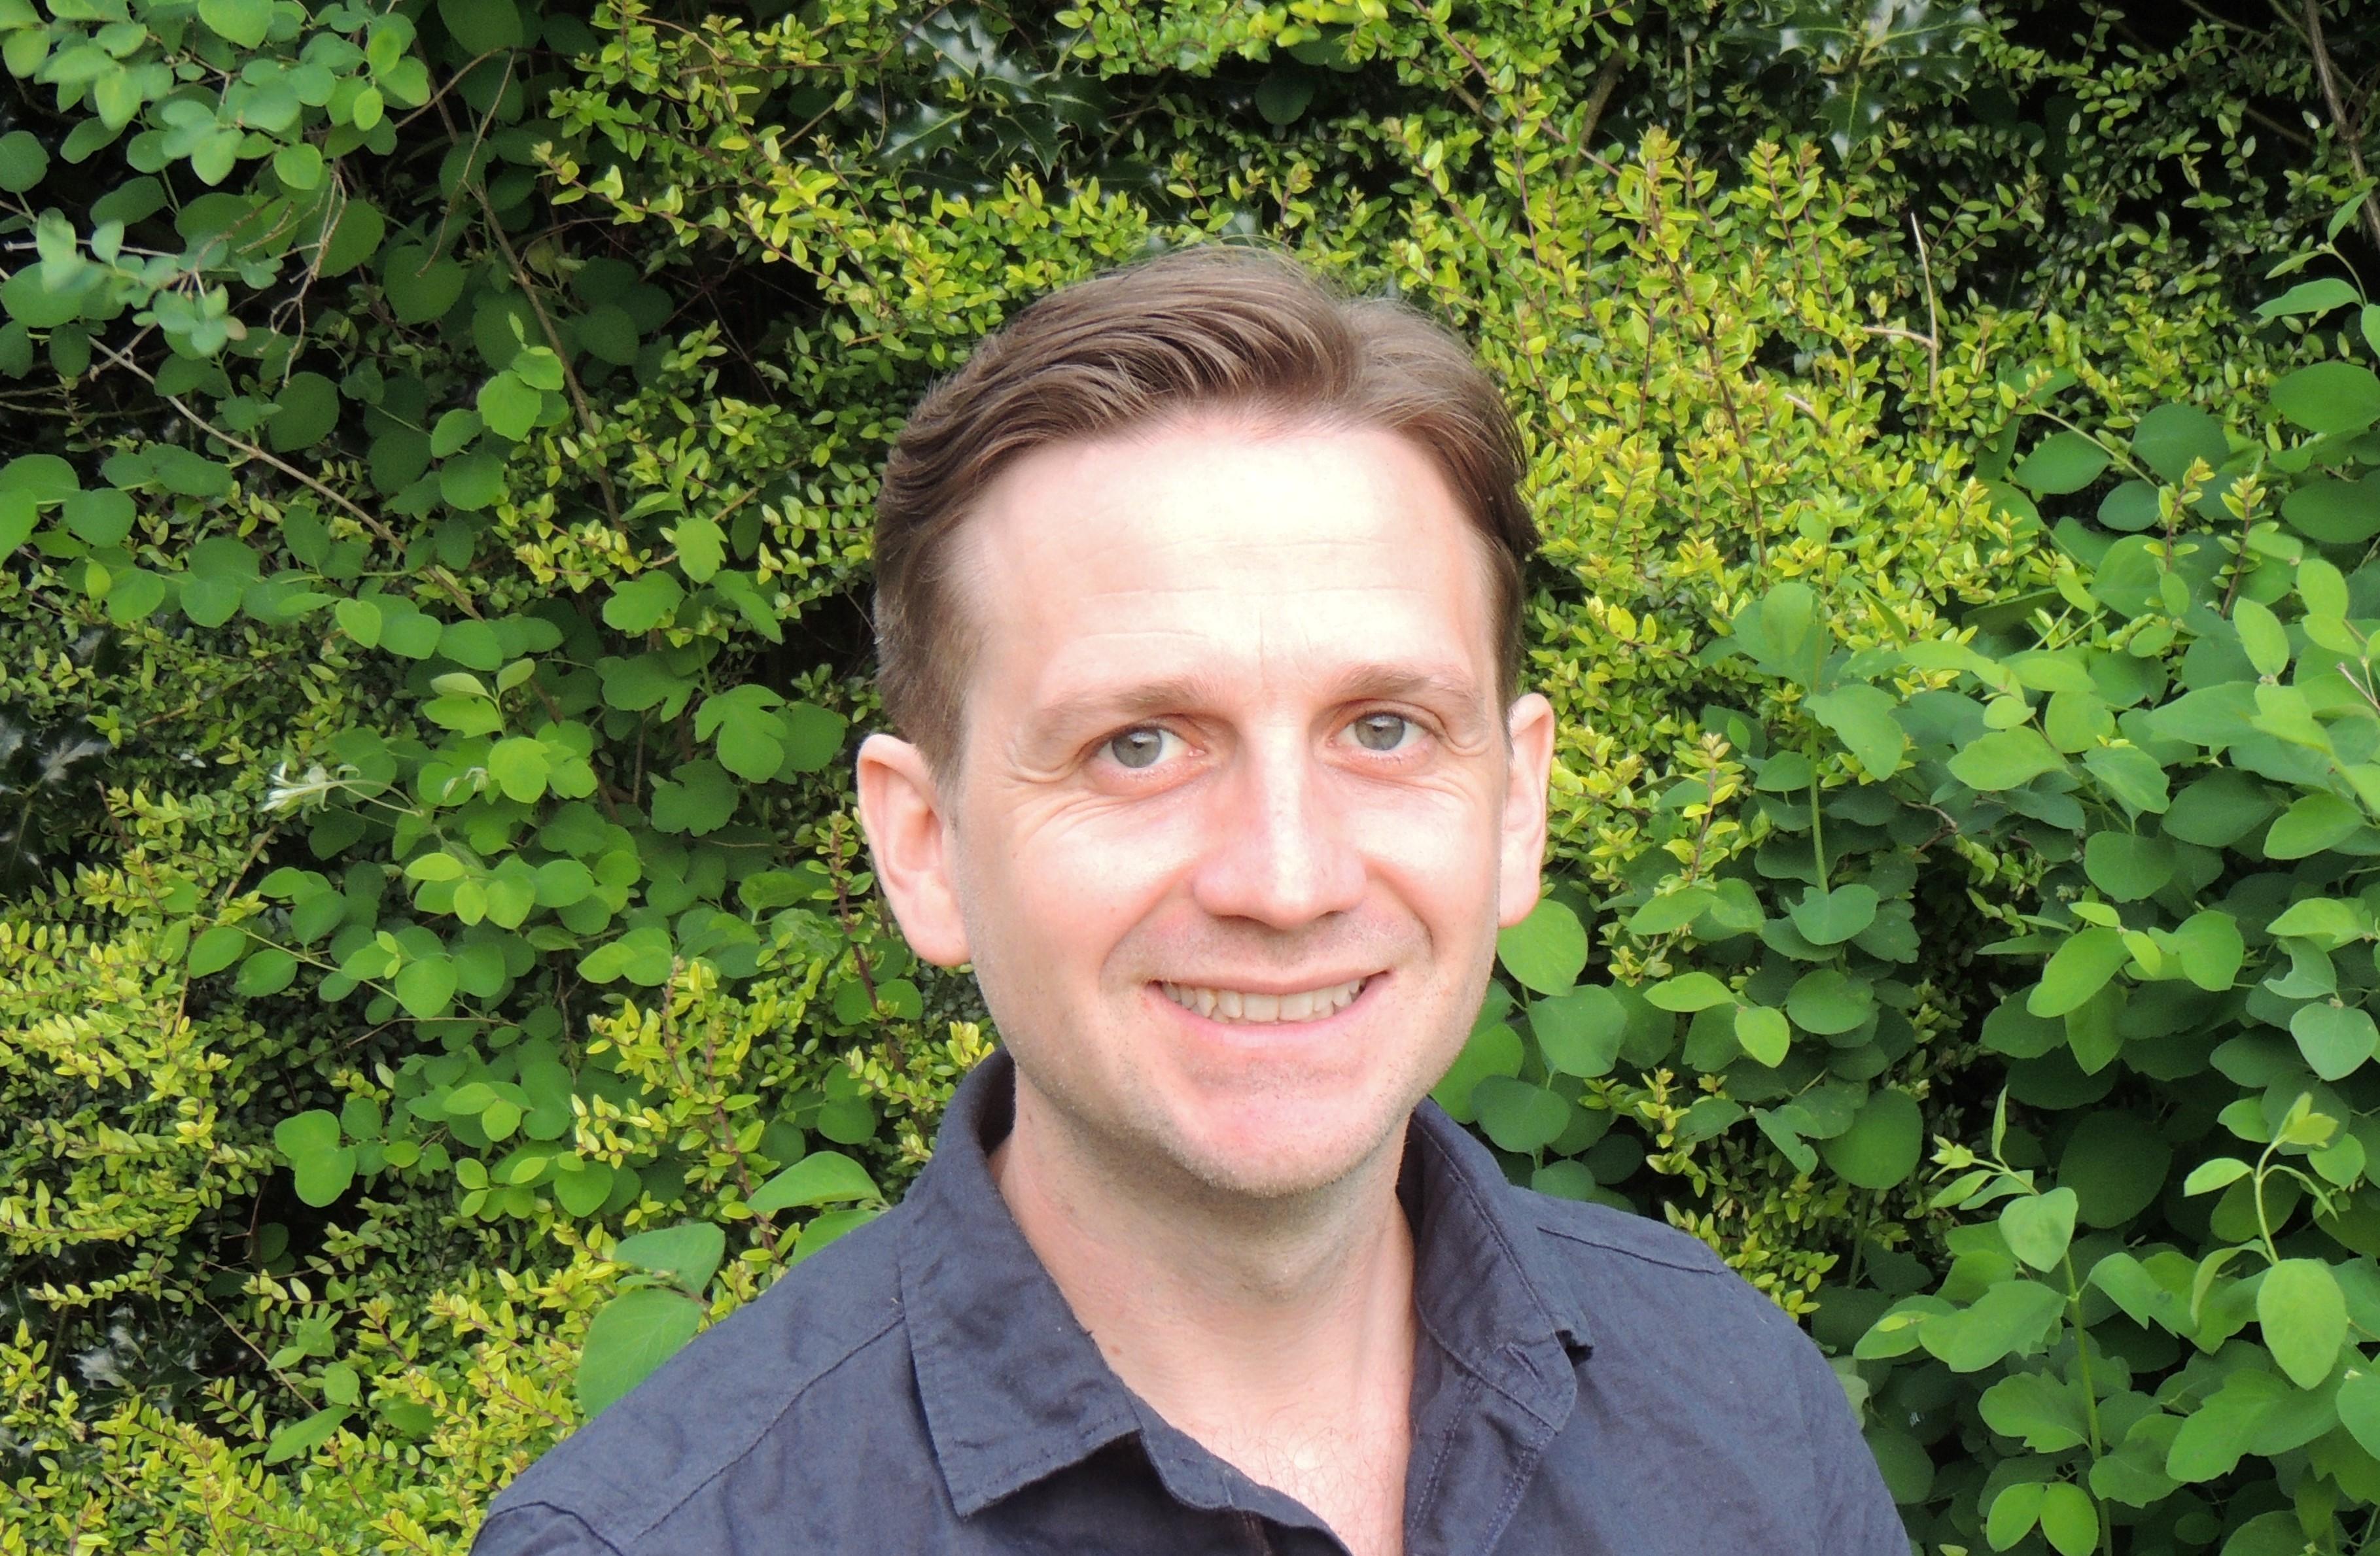 Robert Hairsine